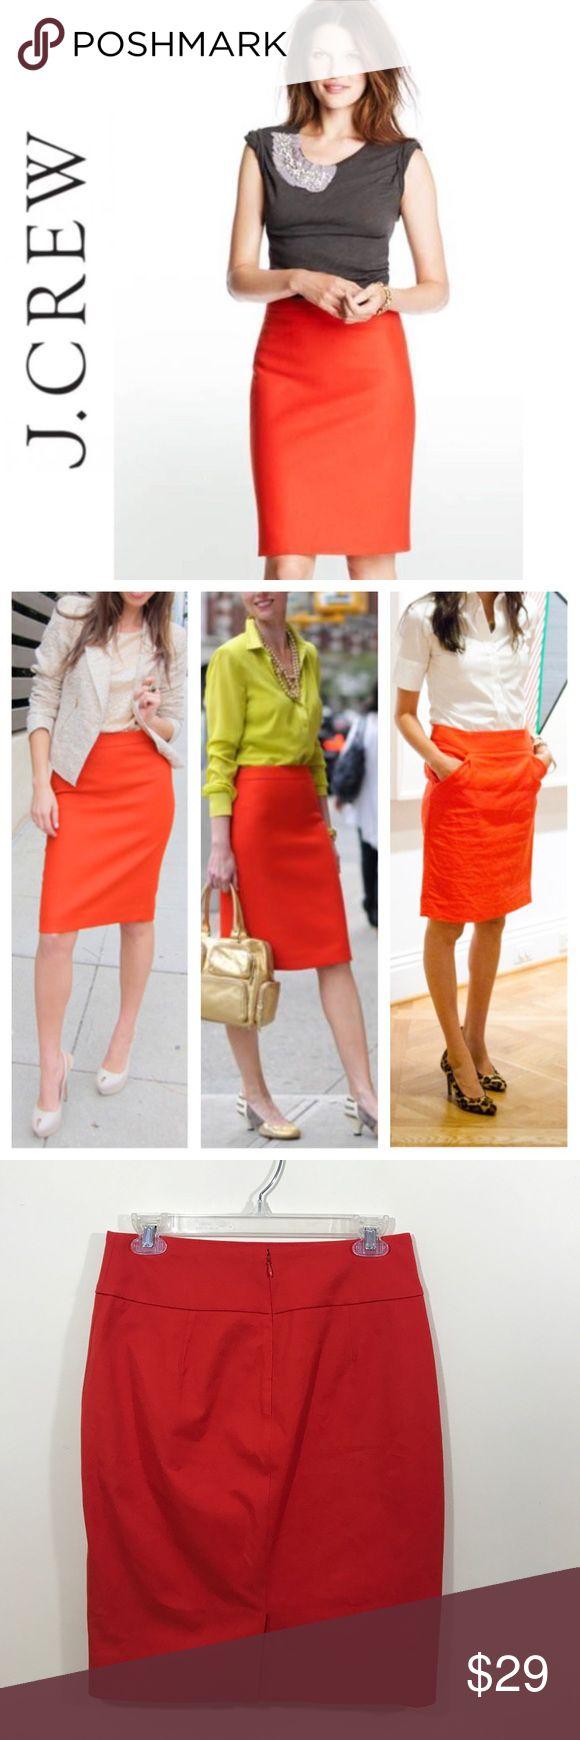 "J. Crew orange pencil skirt In EUC pencil skirt by J. Crew. Double lining. Zipper in back. Measurements: waist 14"" length 21.5"" J. Crew Skirts Pencil"